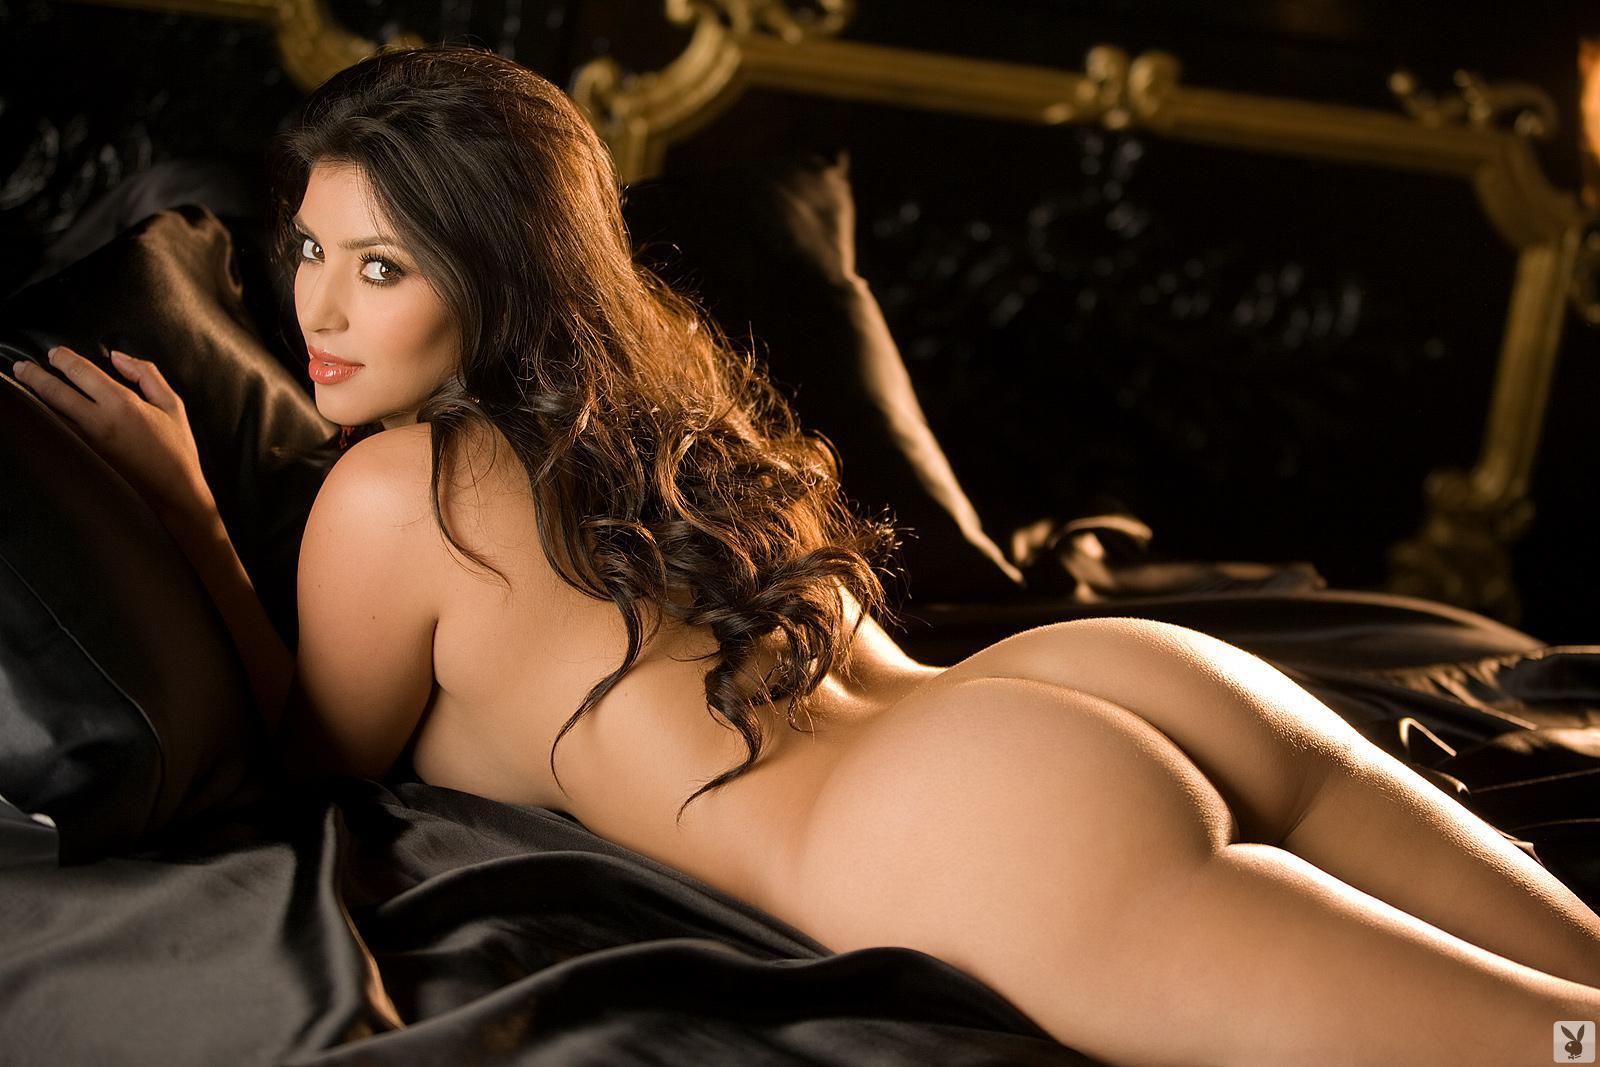 Hot sexsy gir playboy hd video wow nude tube